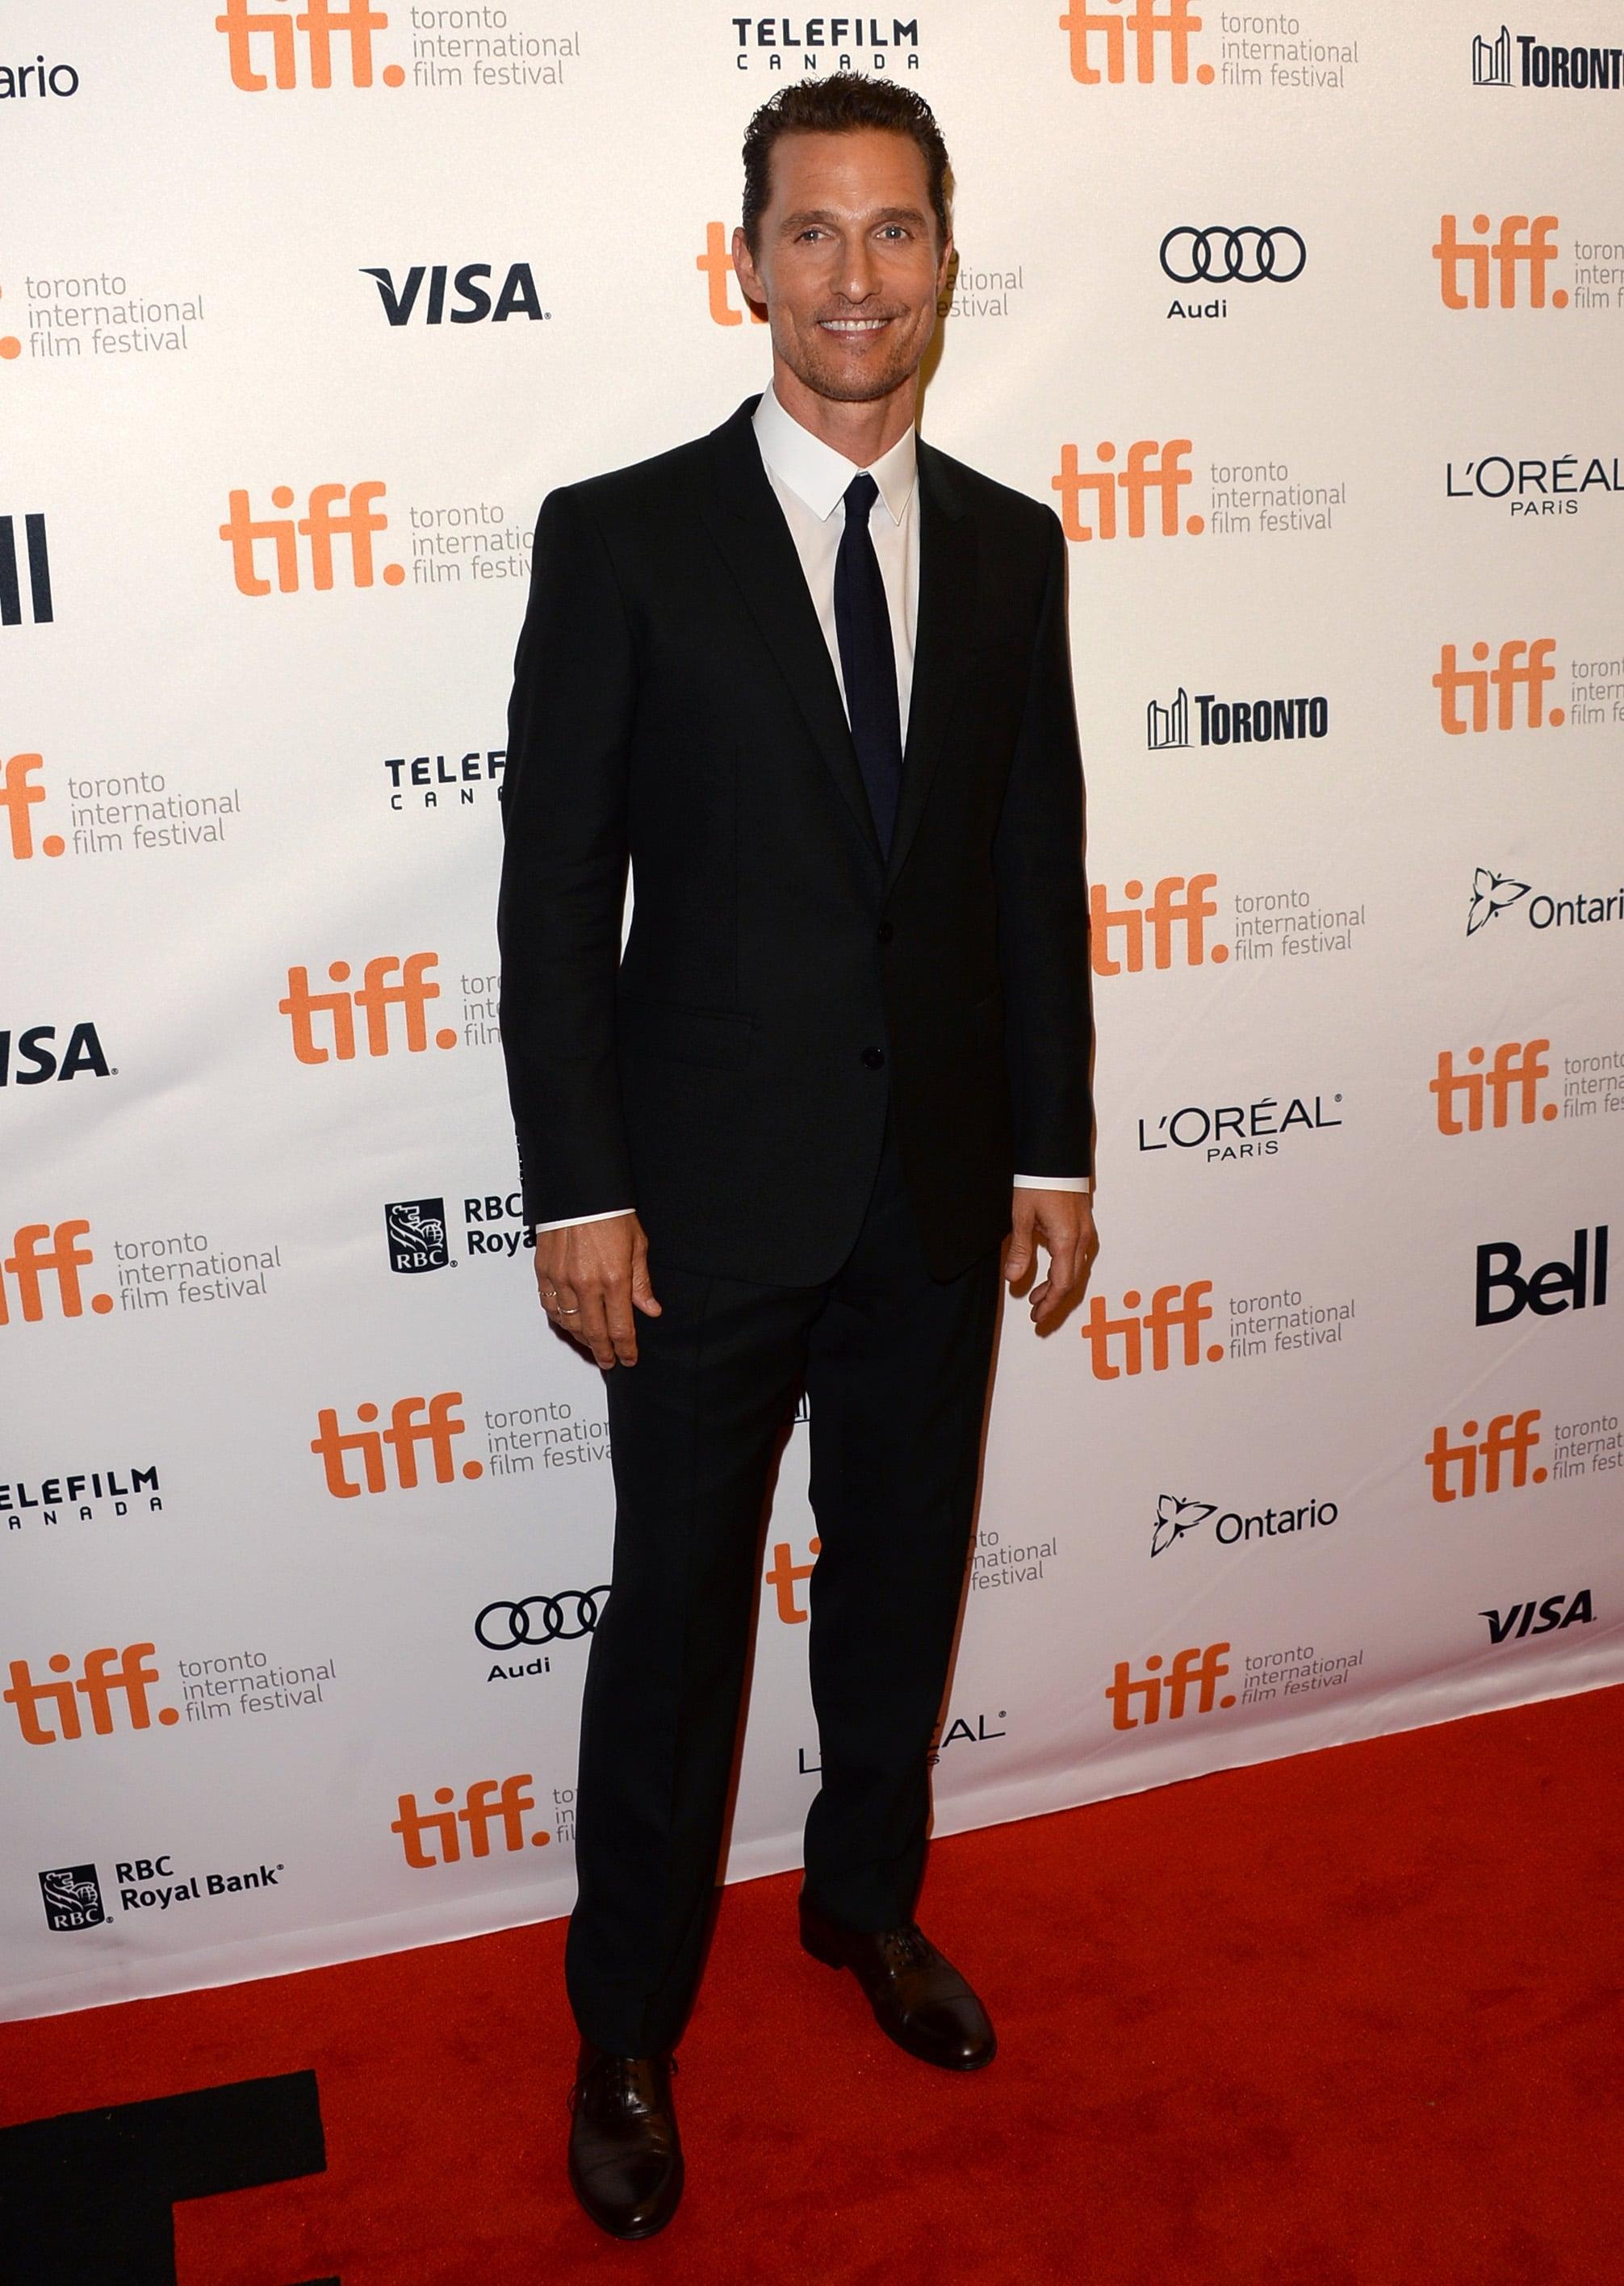 Matthew McConaughey hit the red carpet for the Toronto International Film Festival premiere of Dallas Buyers Club.